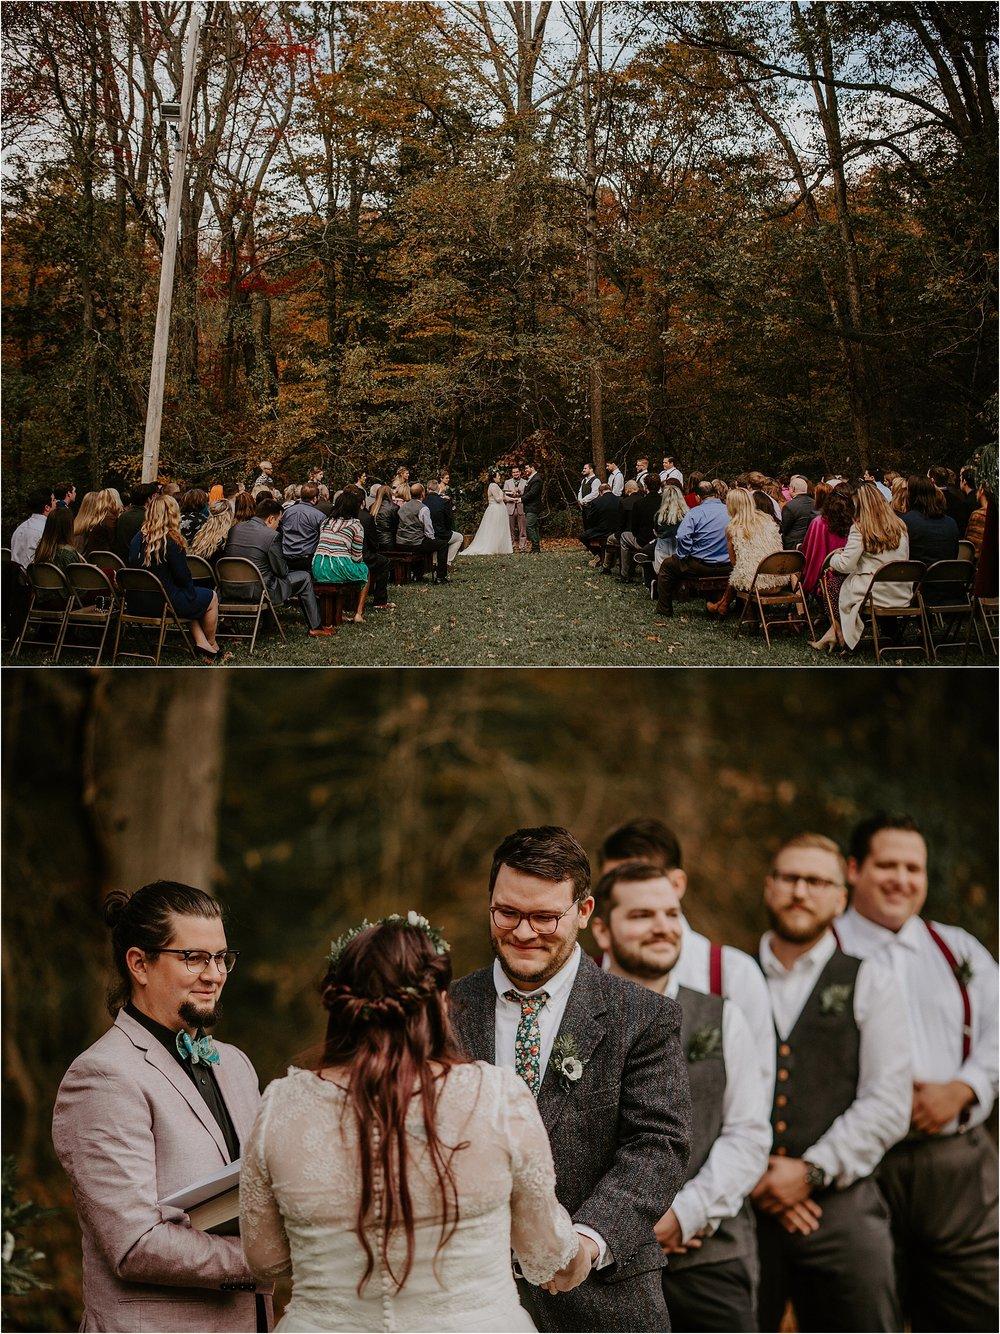 Sarah_Brookhart_Baltimore_Wedding_Photographer_0043.jpg